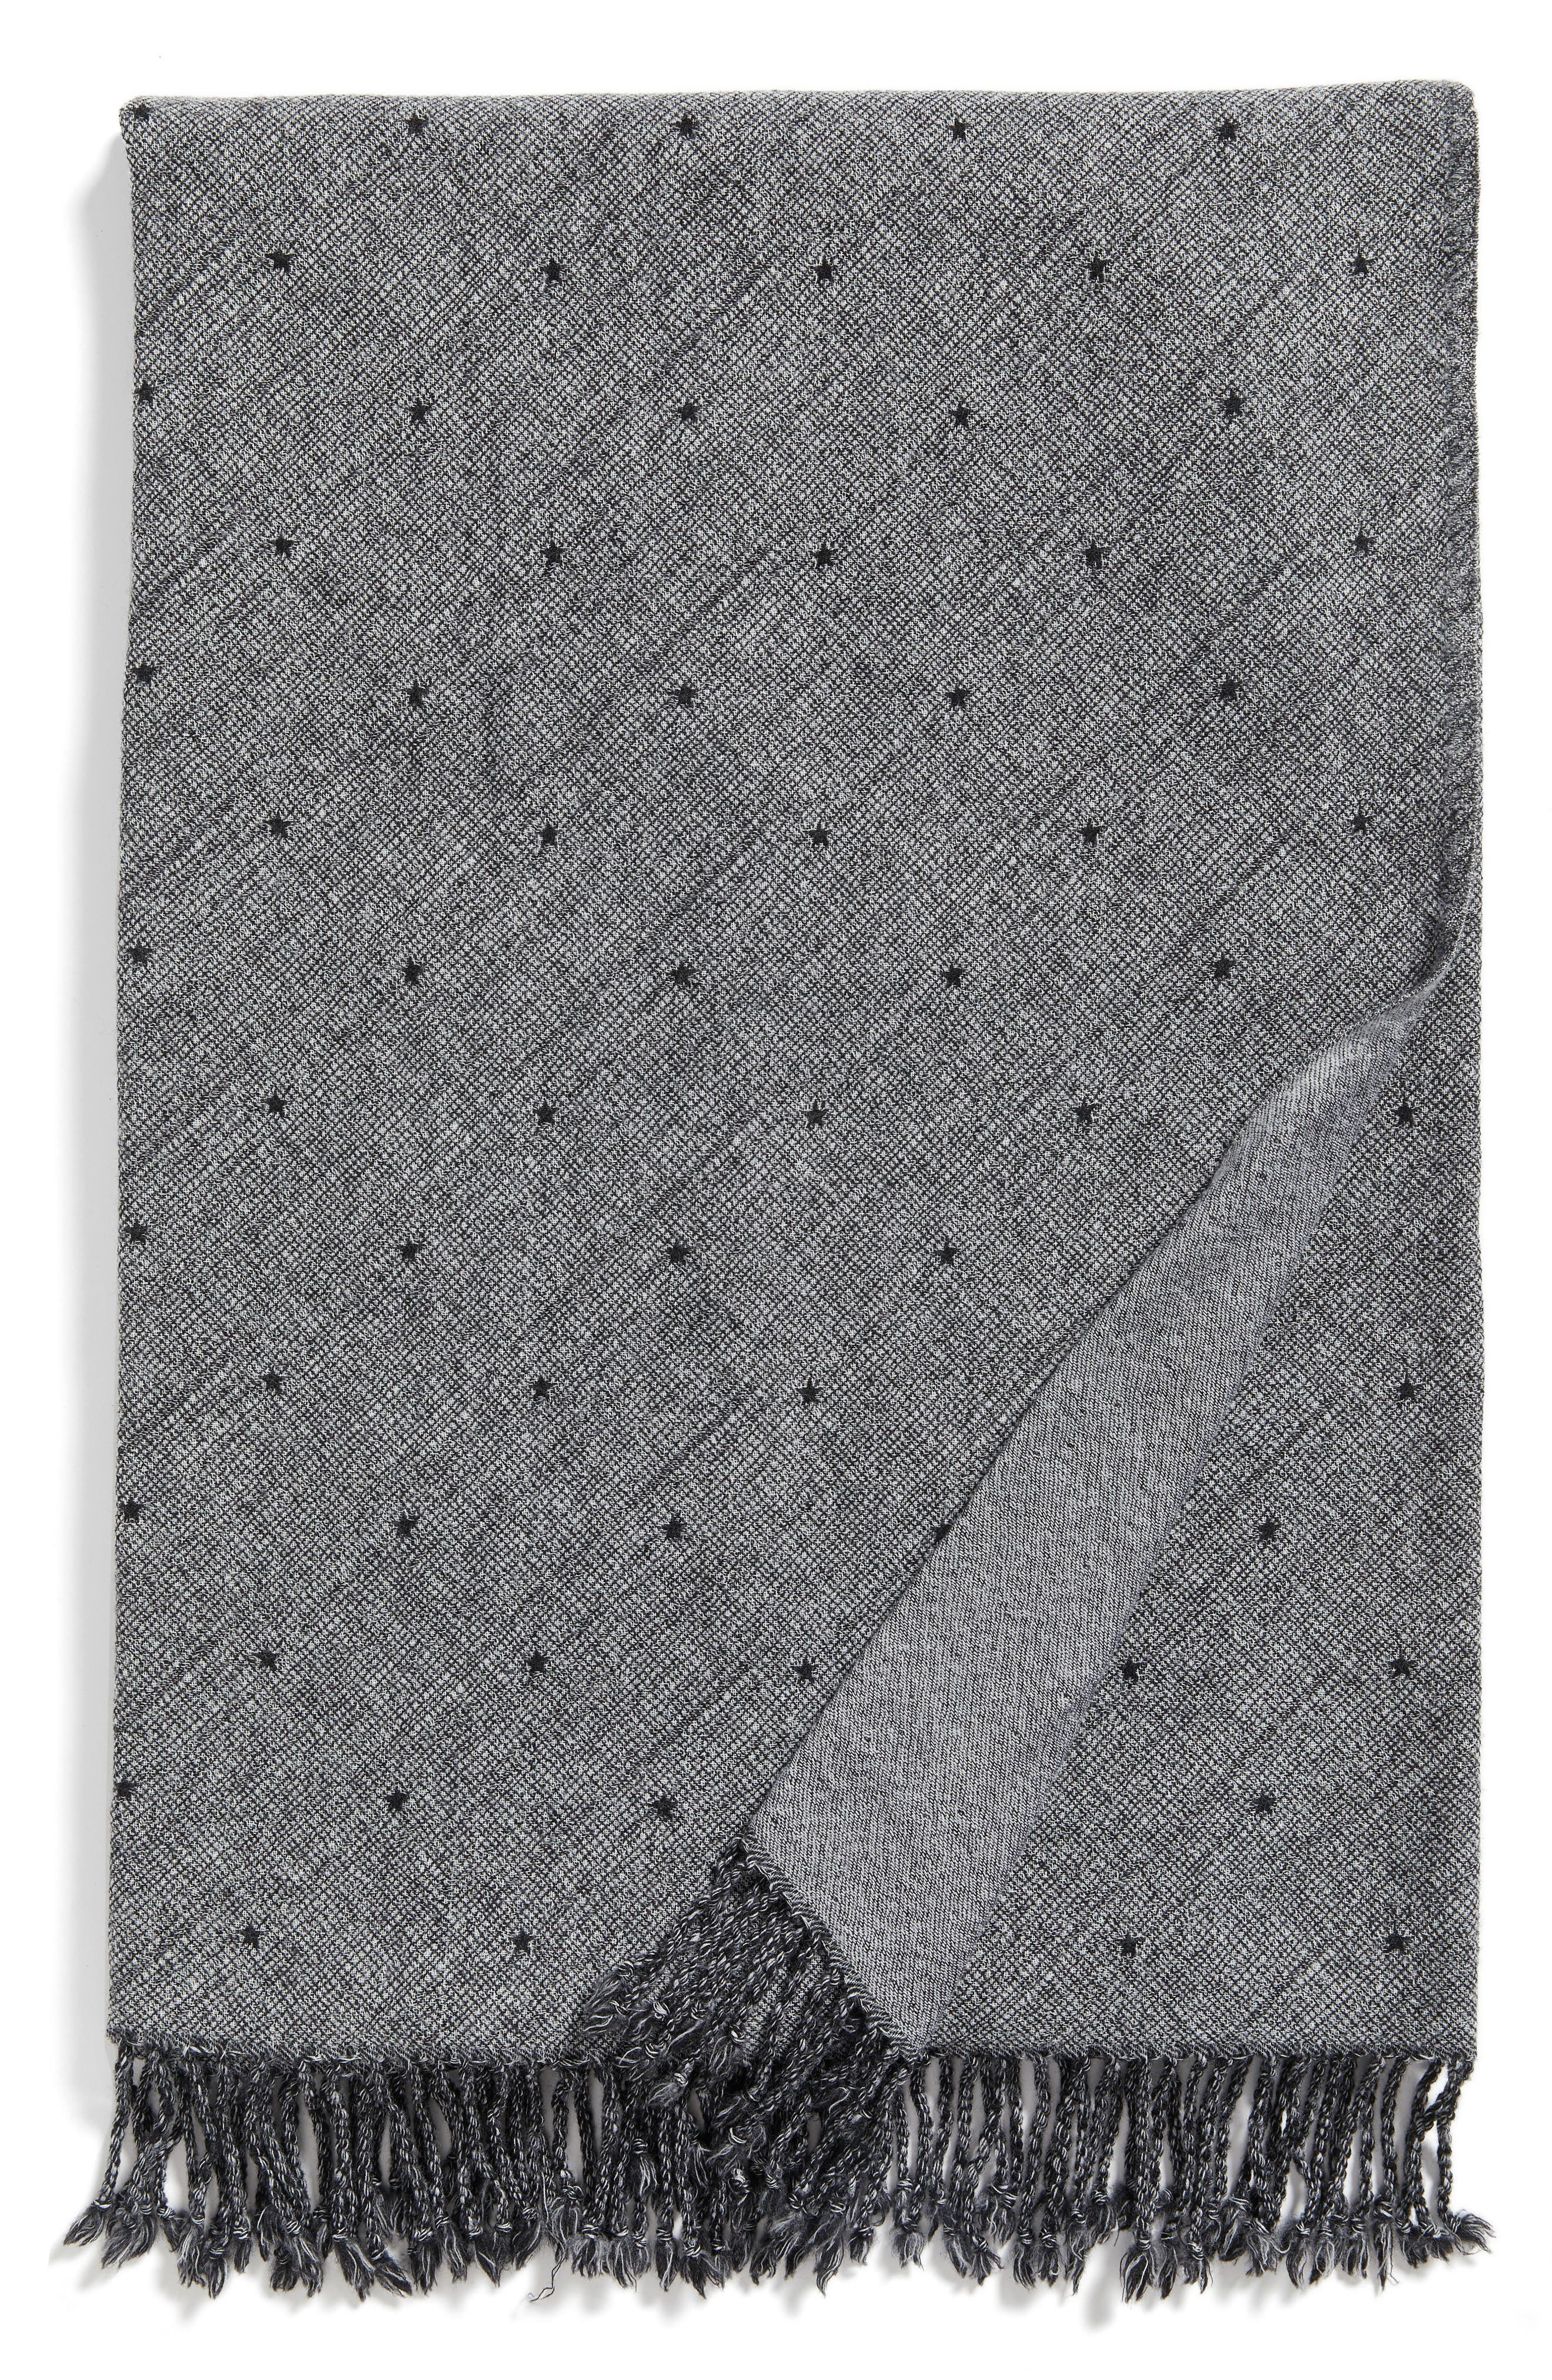 Blackstar Double Face Merino Wool Throw,                             Main thumbnail 1, color,                             BLACKSTAR